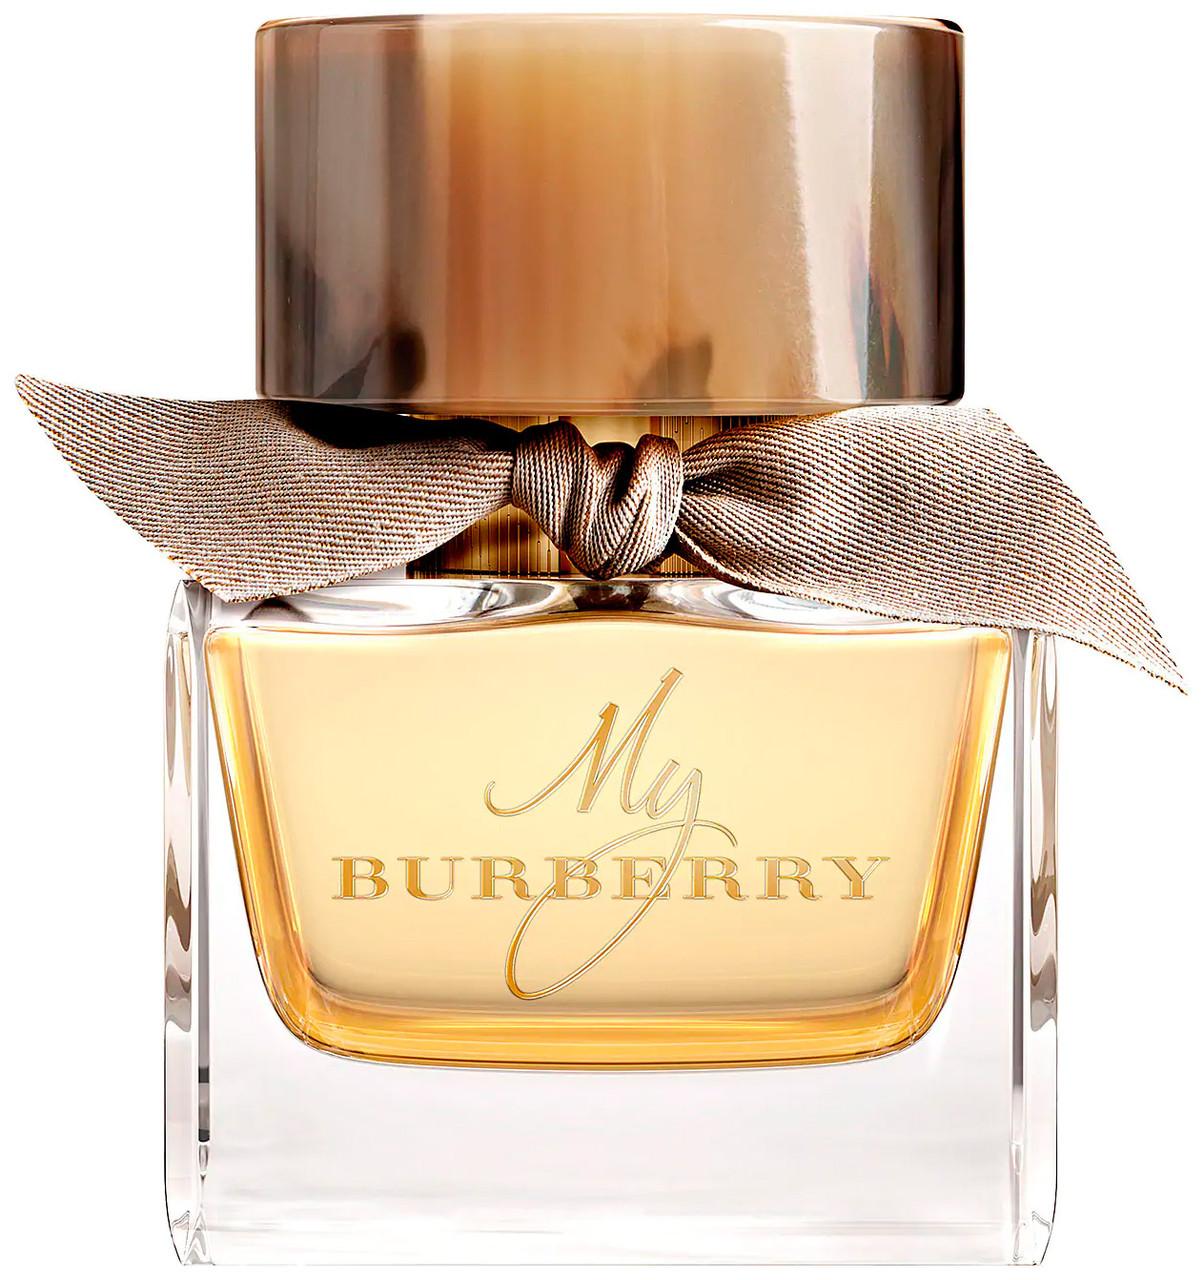 Burberry My Burberry 100 ml Женская парфюмерная вода реплика